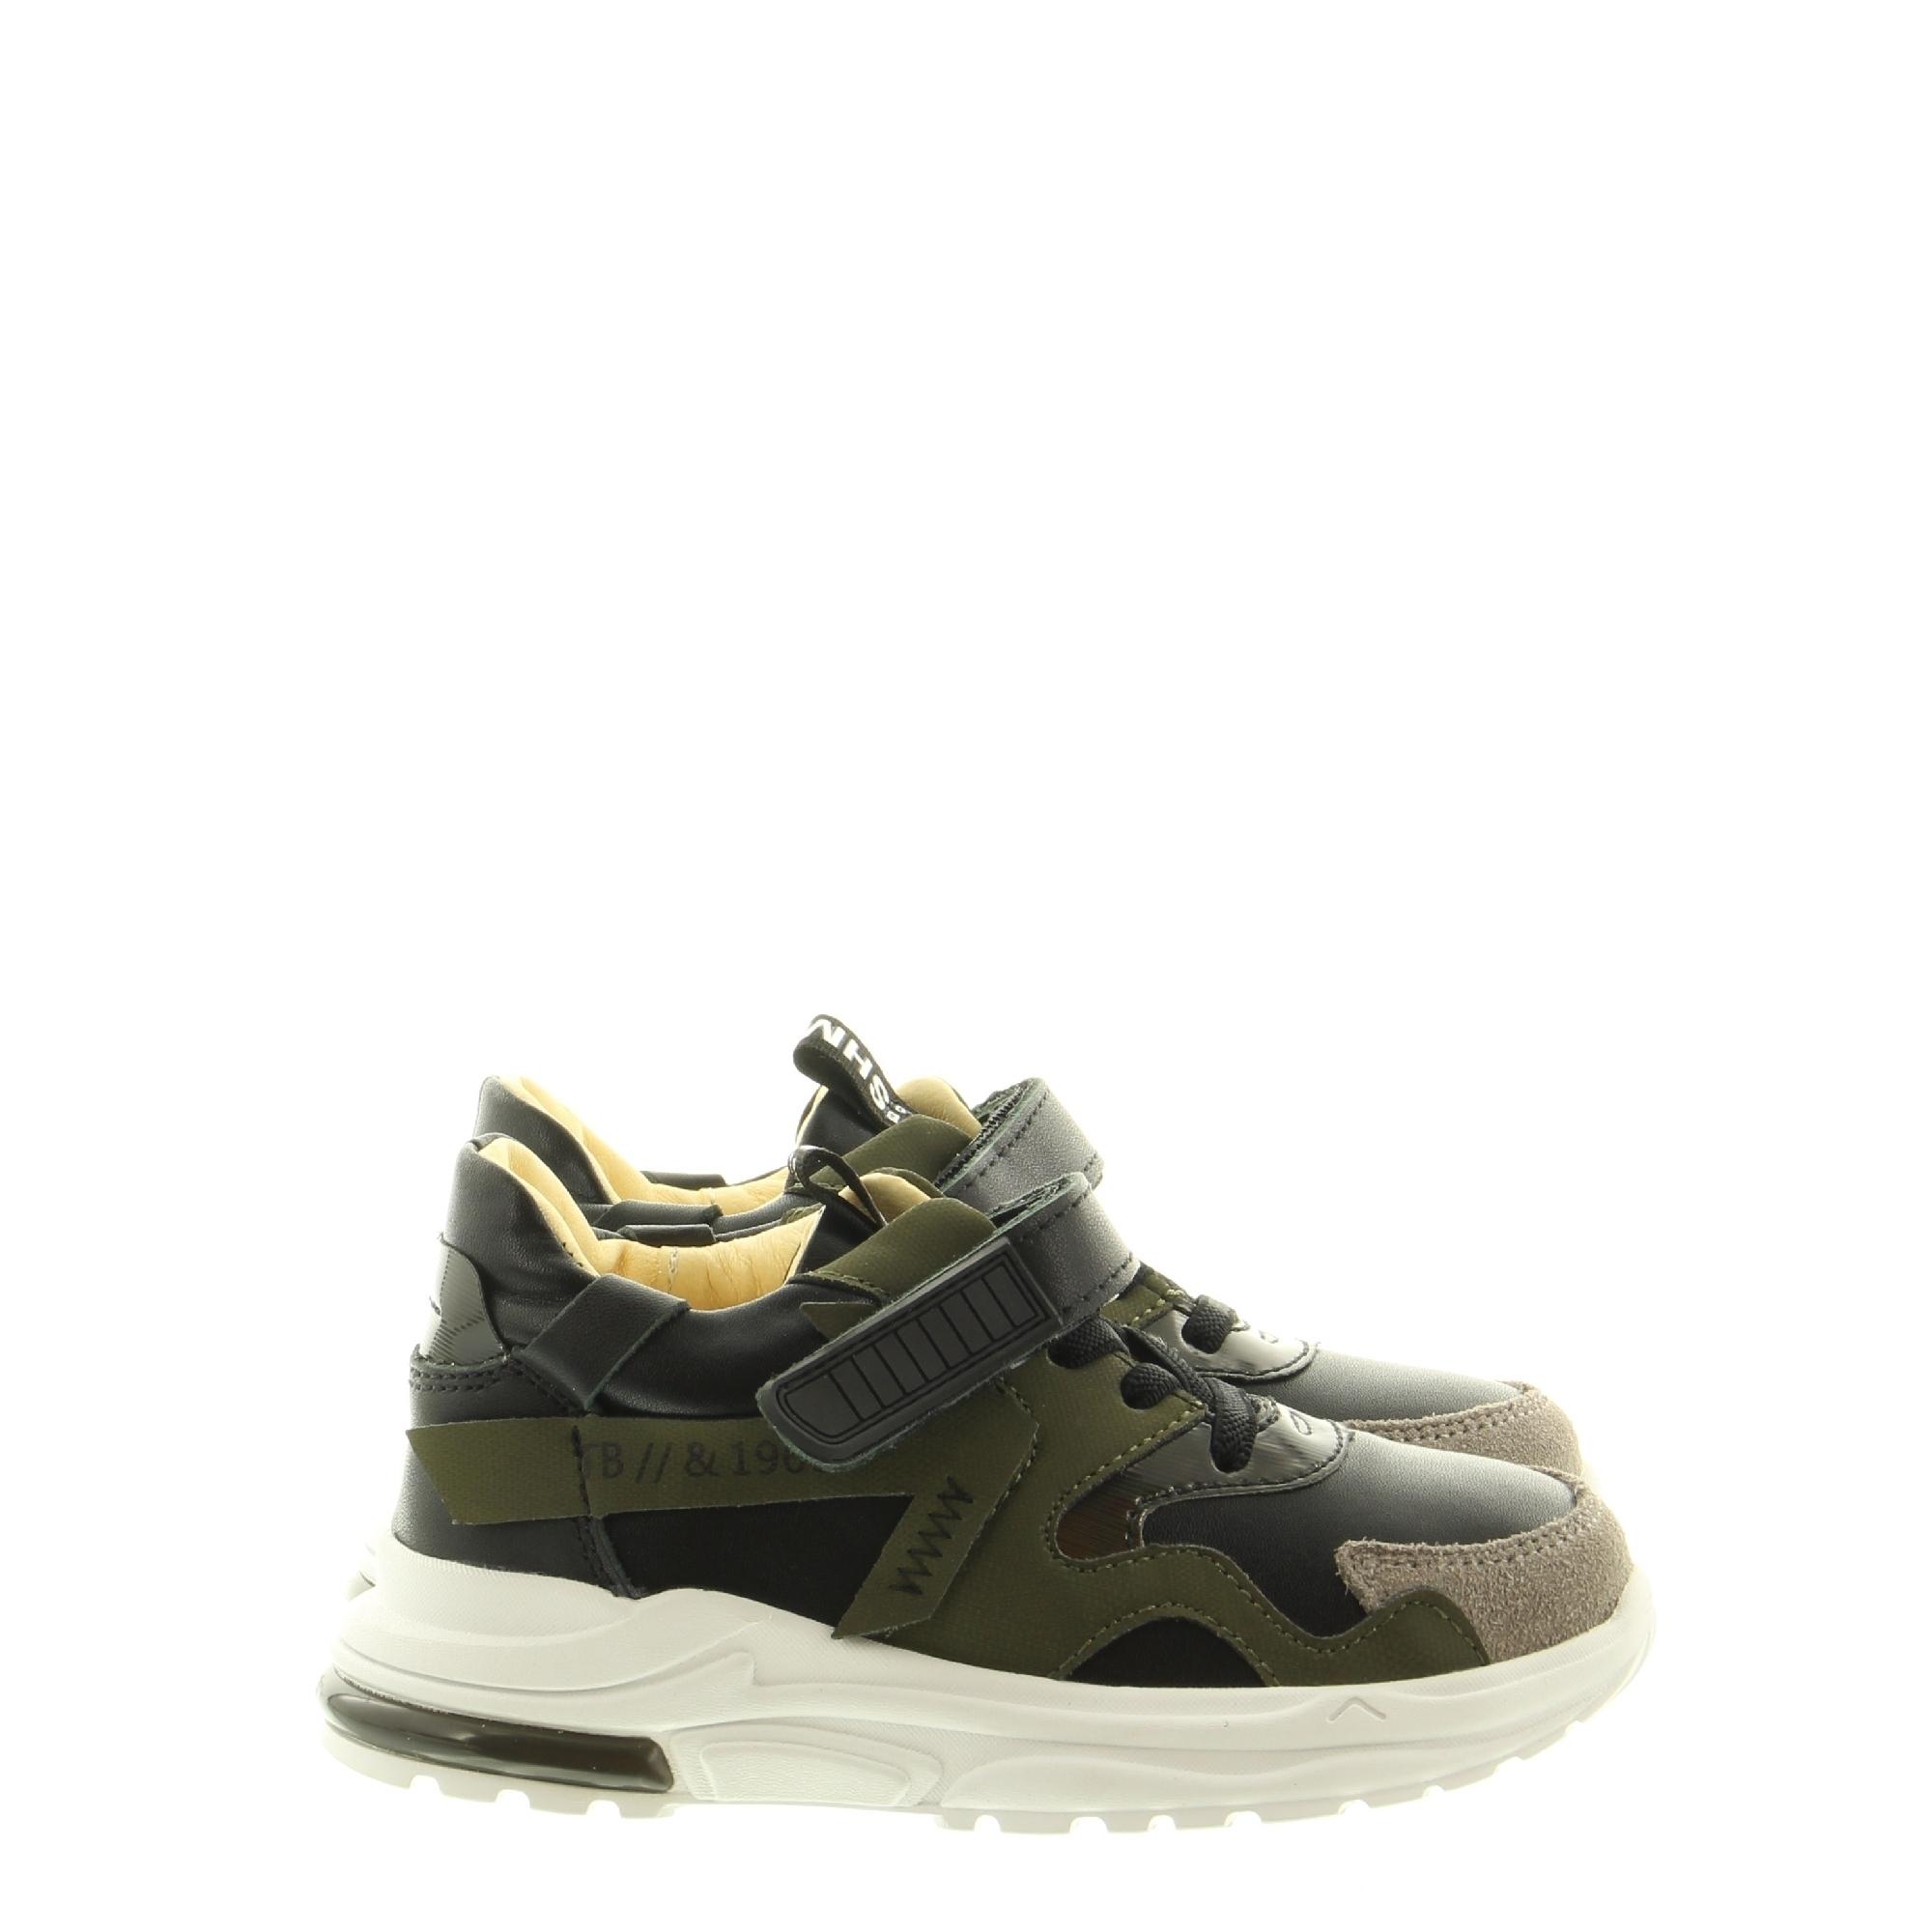 ShoesMe NR20W001-C Trainer Black Green